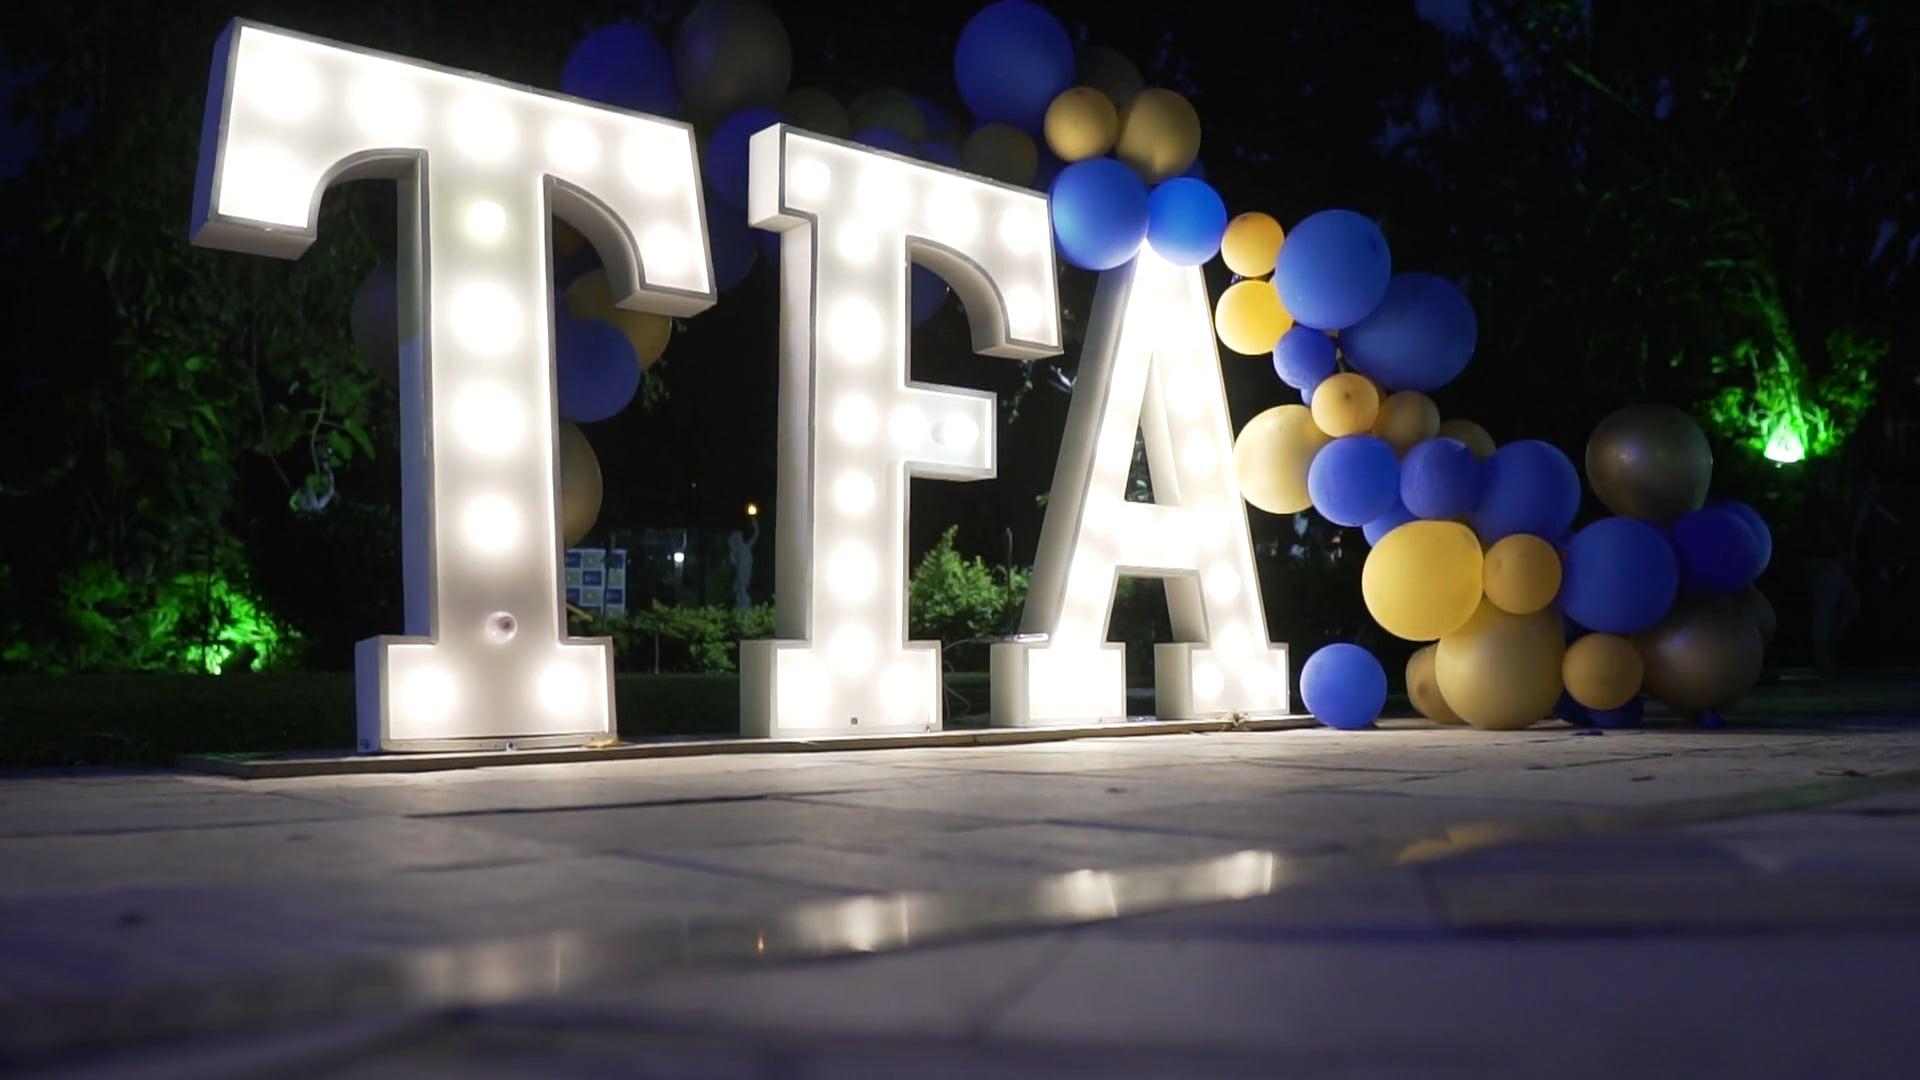 TFA | Confra 2019